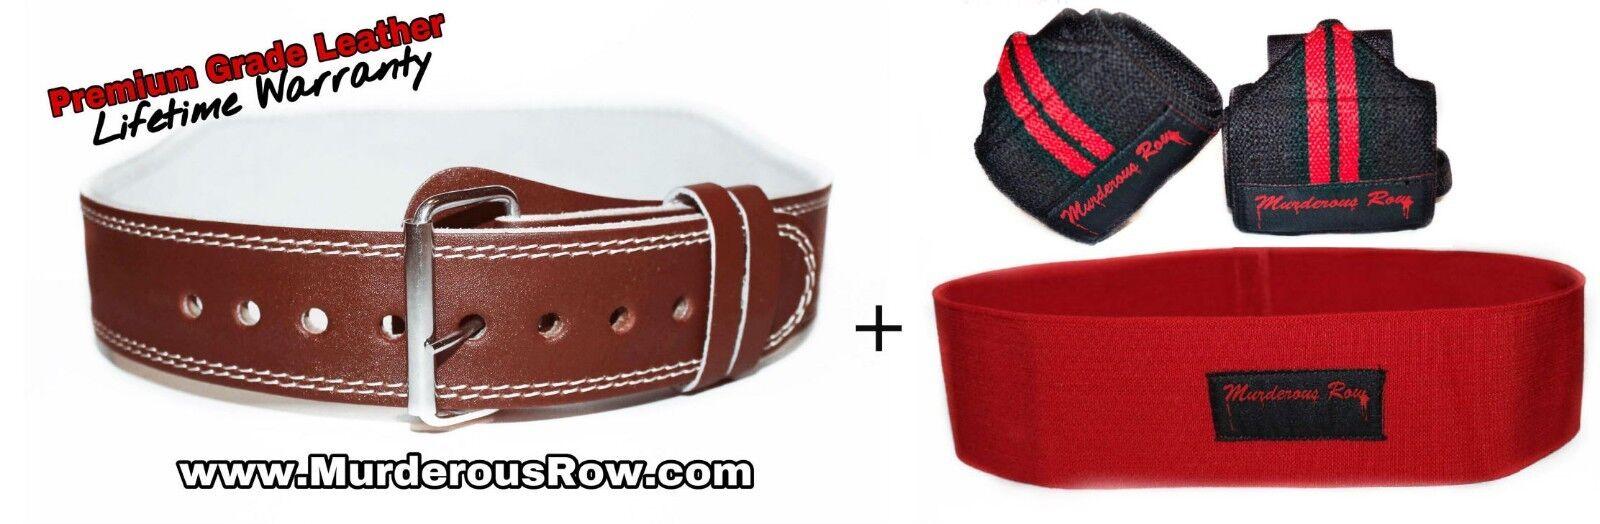 Murderous Row Powerlifting Belt (L) + Hip Circle +  Wrist Wraps -INSANE SQUAT SET  the newest